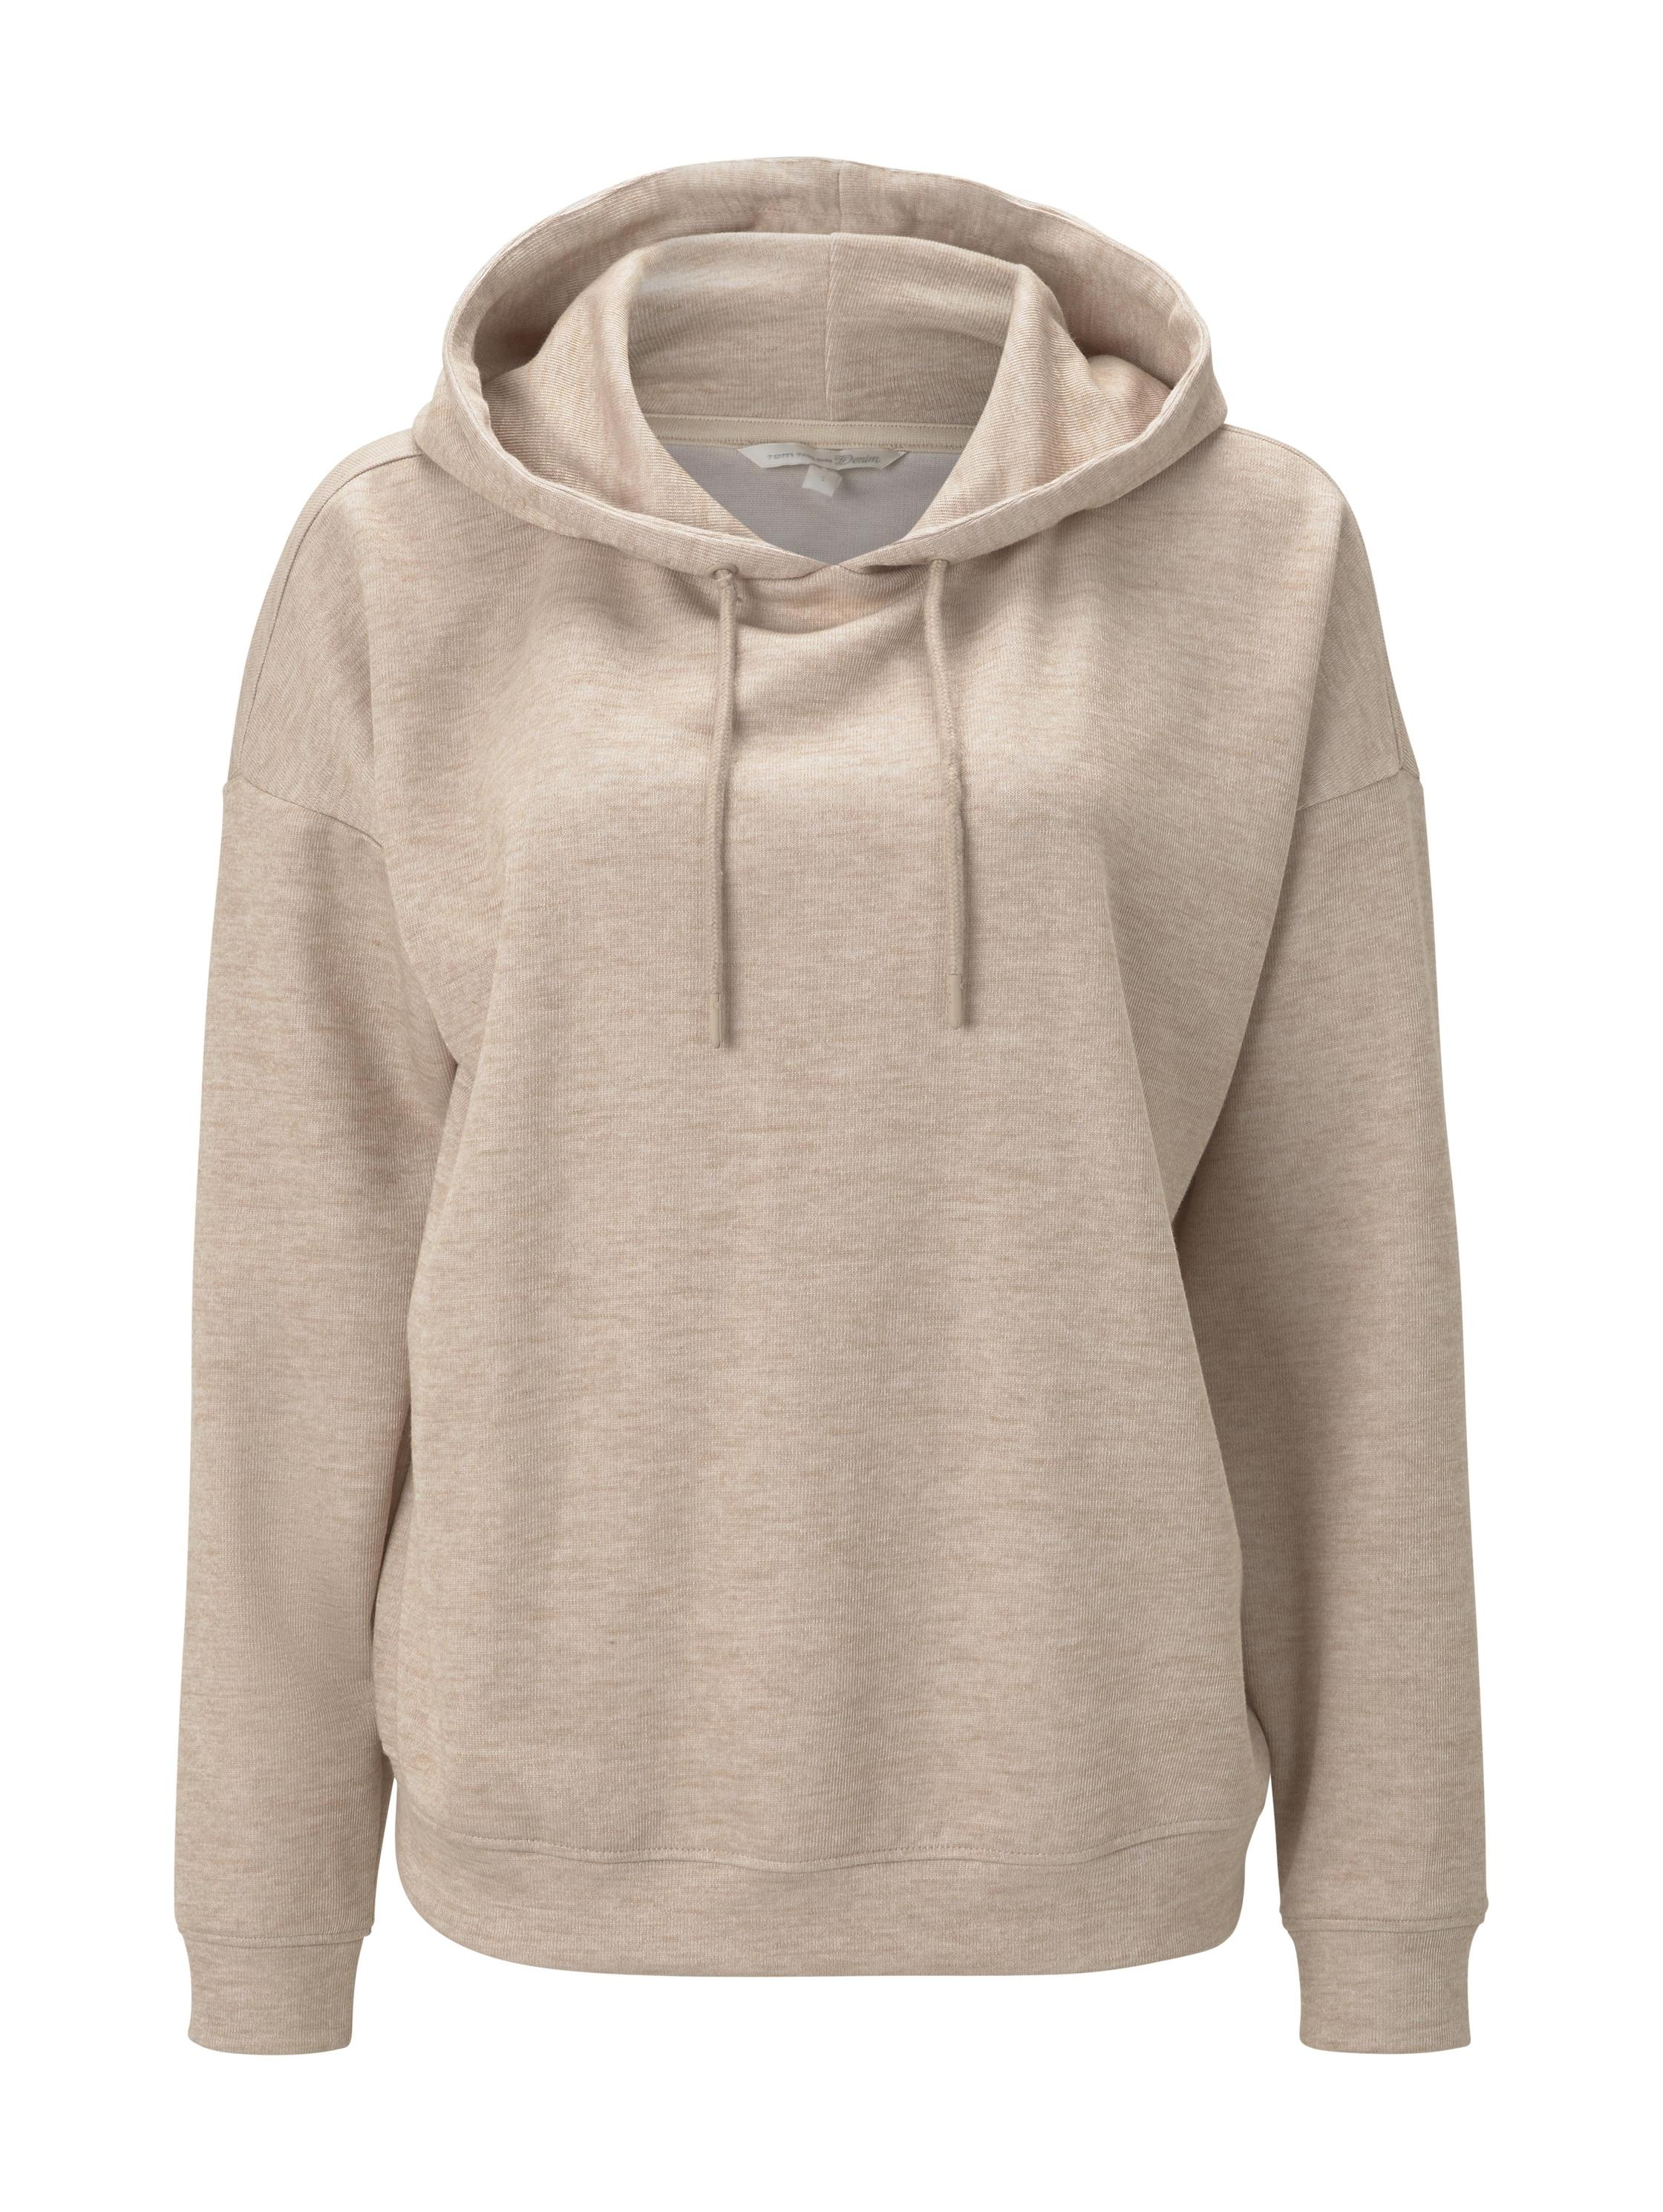 oversized hoodie, cozy beige melange